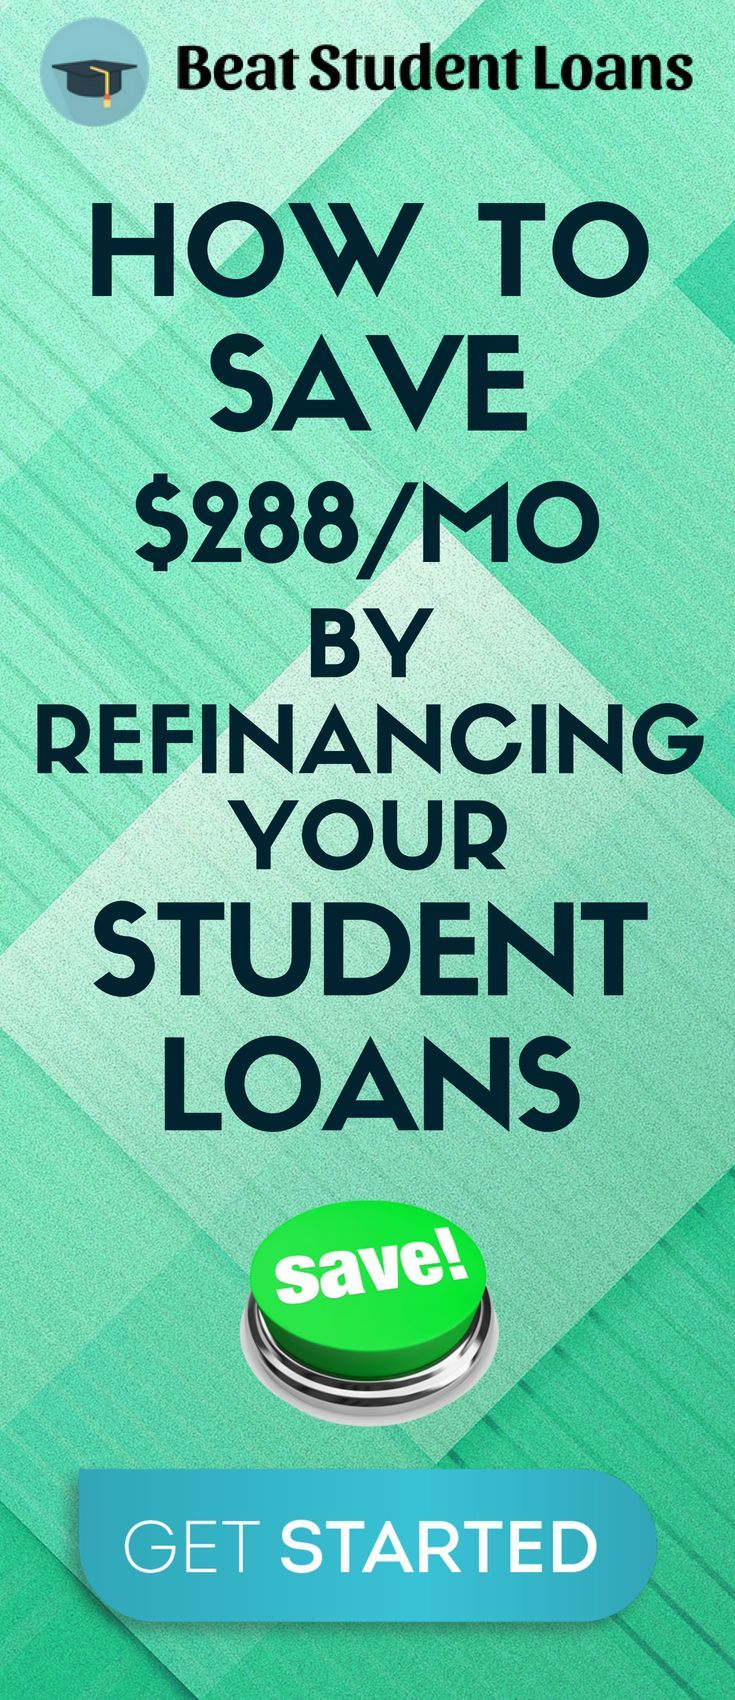 Refinance Student Loans Reddit Top Lenders 2020 Beat Student Loans Refinance Student Loans Student Loans Student Loan Payment